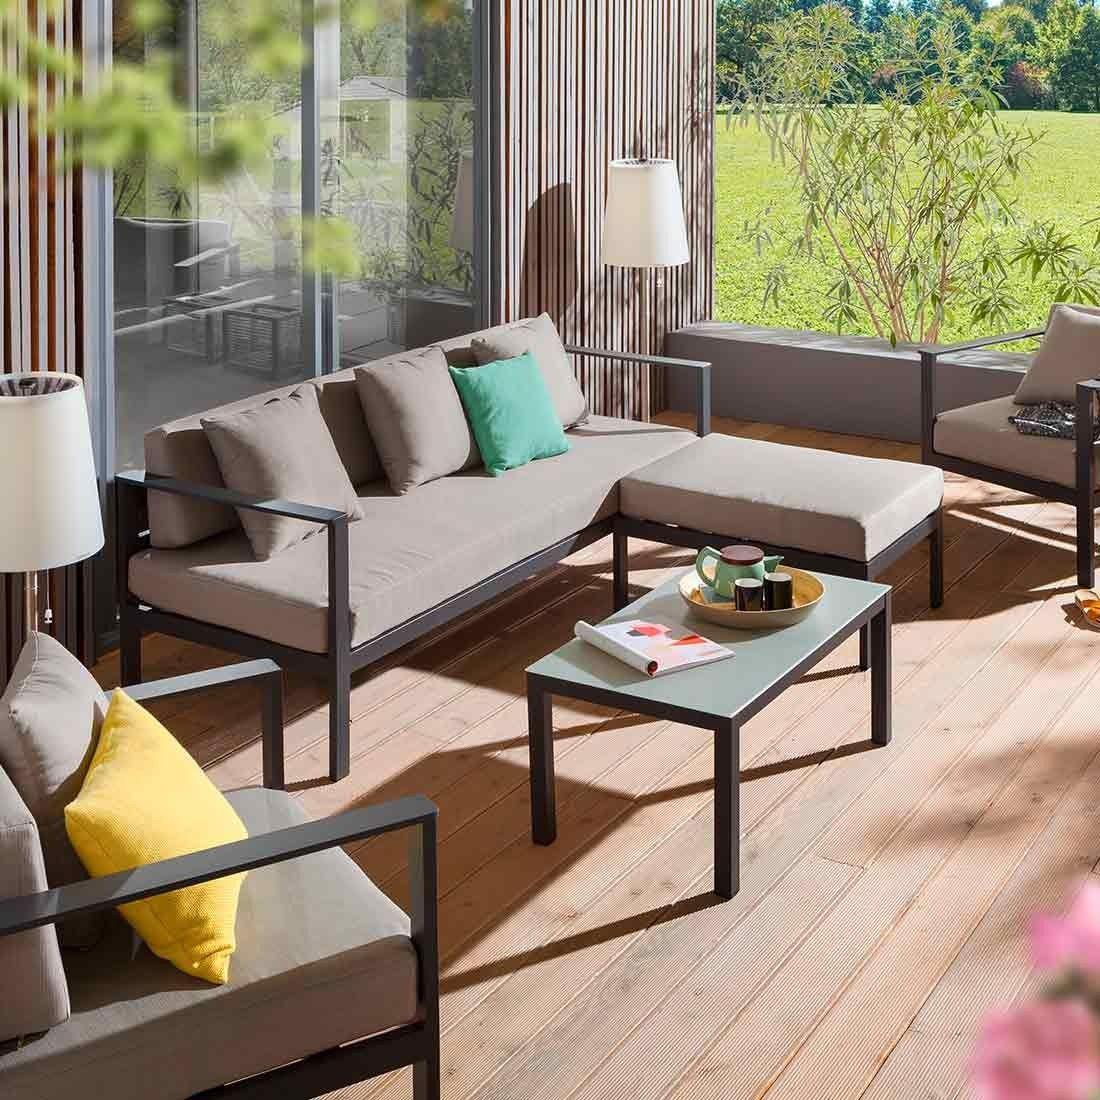 Full Size of Loungemöbel Aluminium Lange Gwand 1 Garten Günstig Holz Fenster Verbundplatte Küche Wohnzimmer Loungemöbel Aluminium